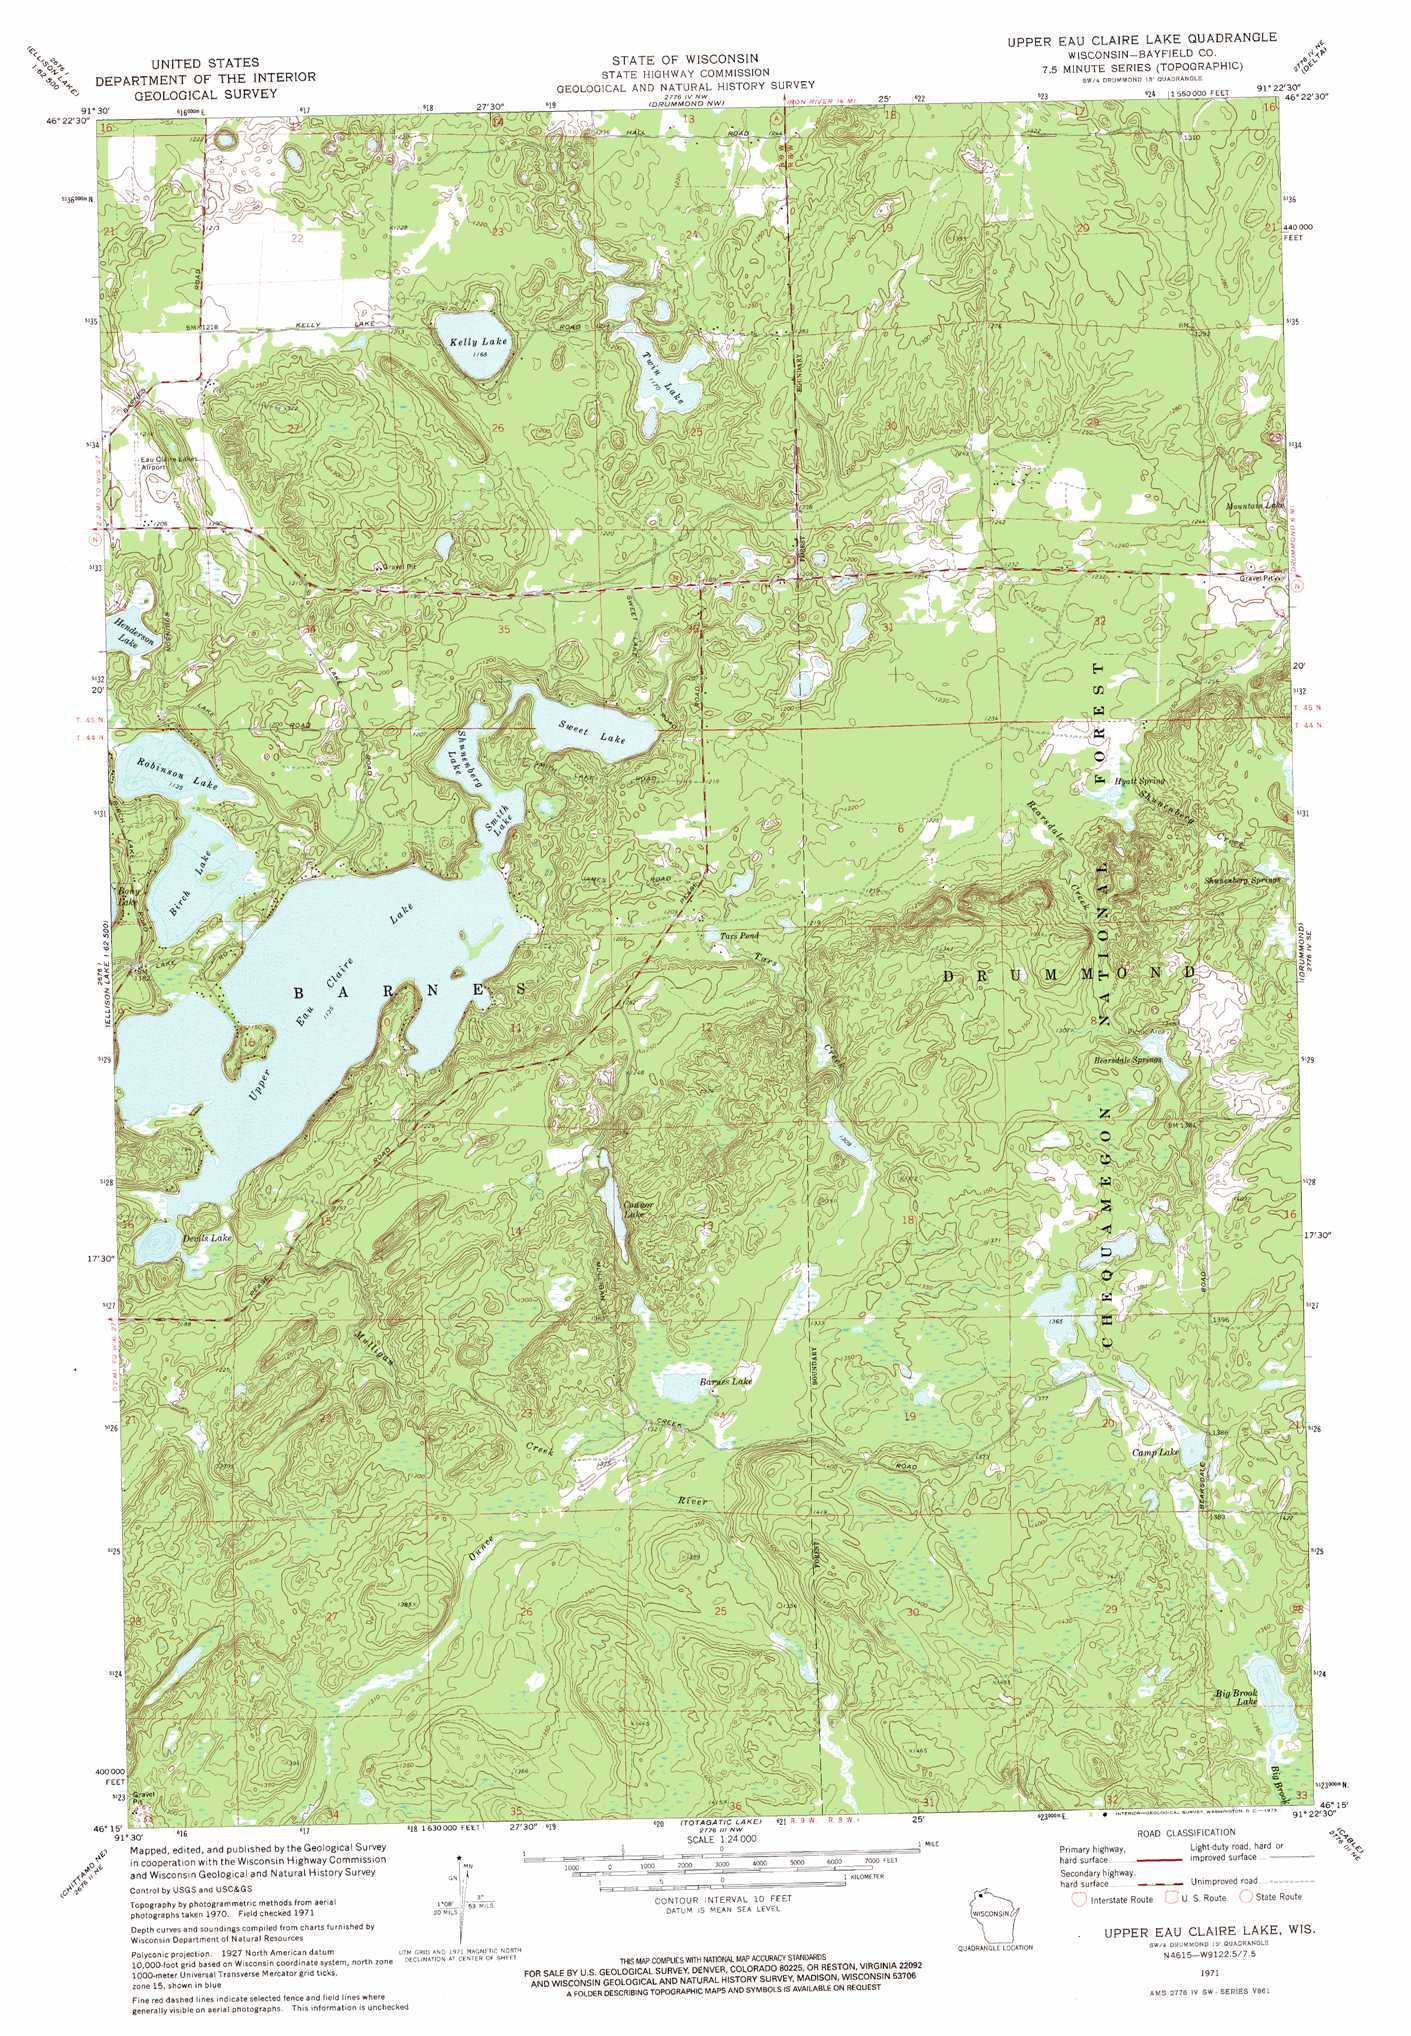 Upper Eau Claire Lake Topographic Map WI USGS Topo Quad C - Wisconsin topographic lake maps